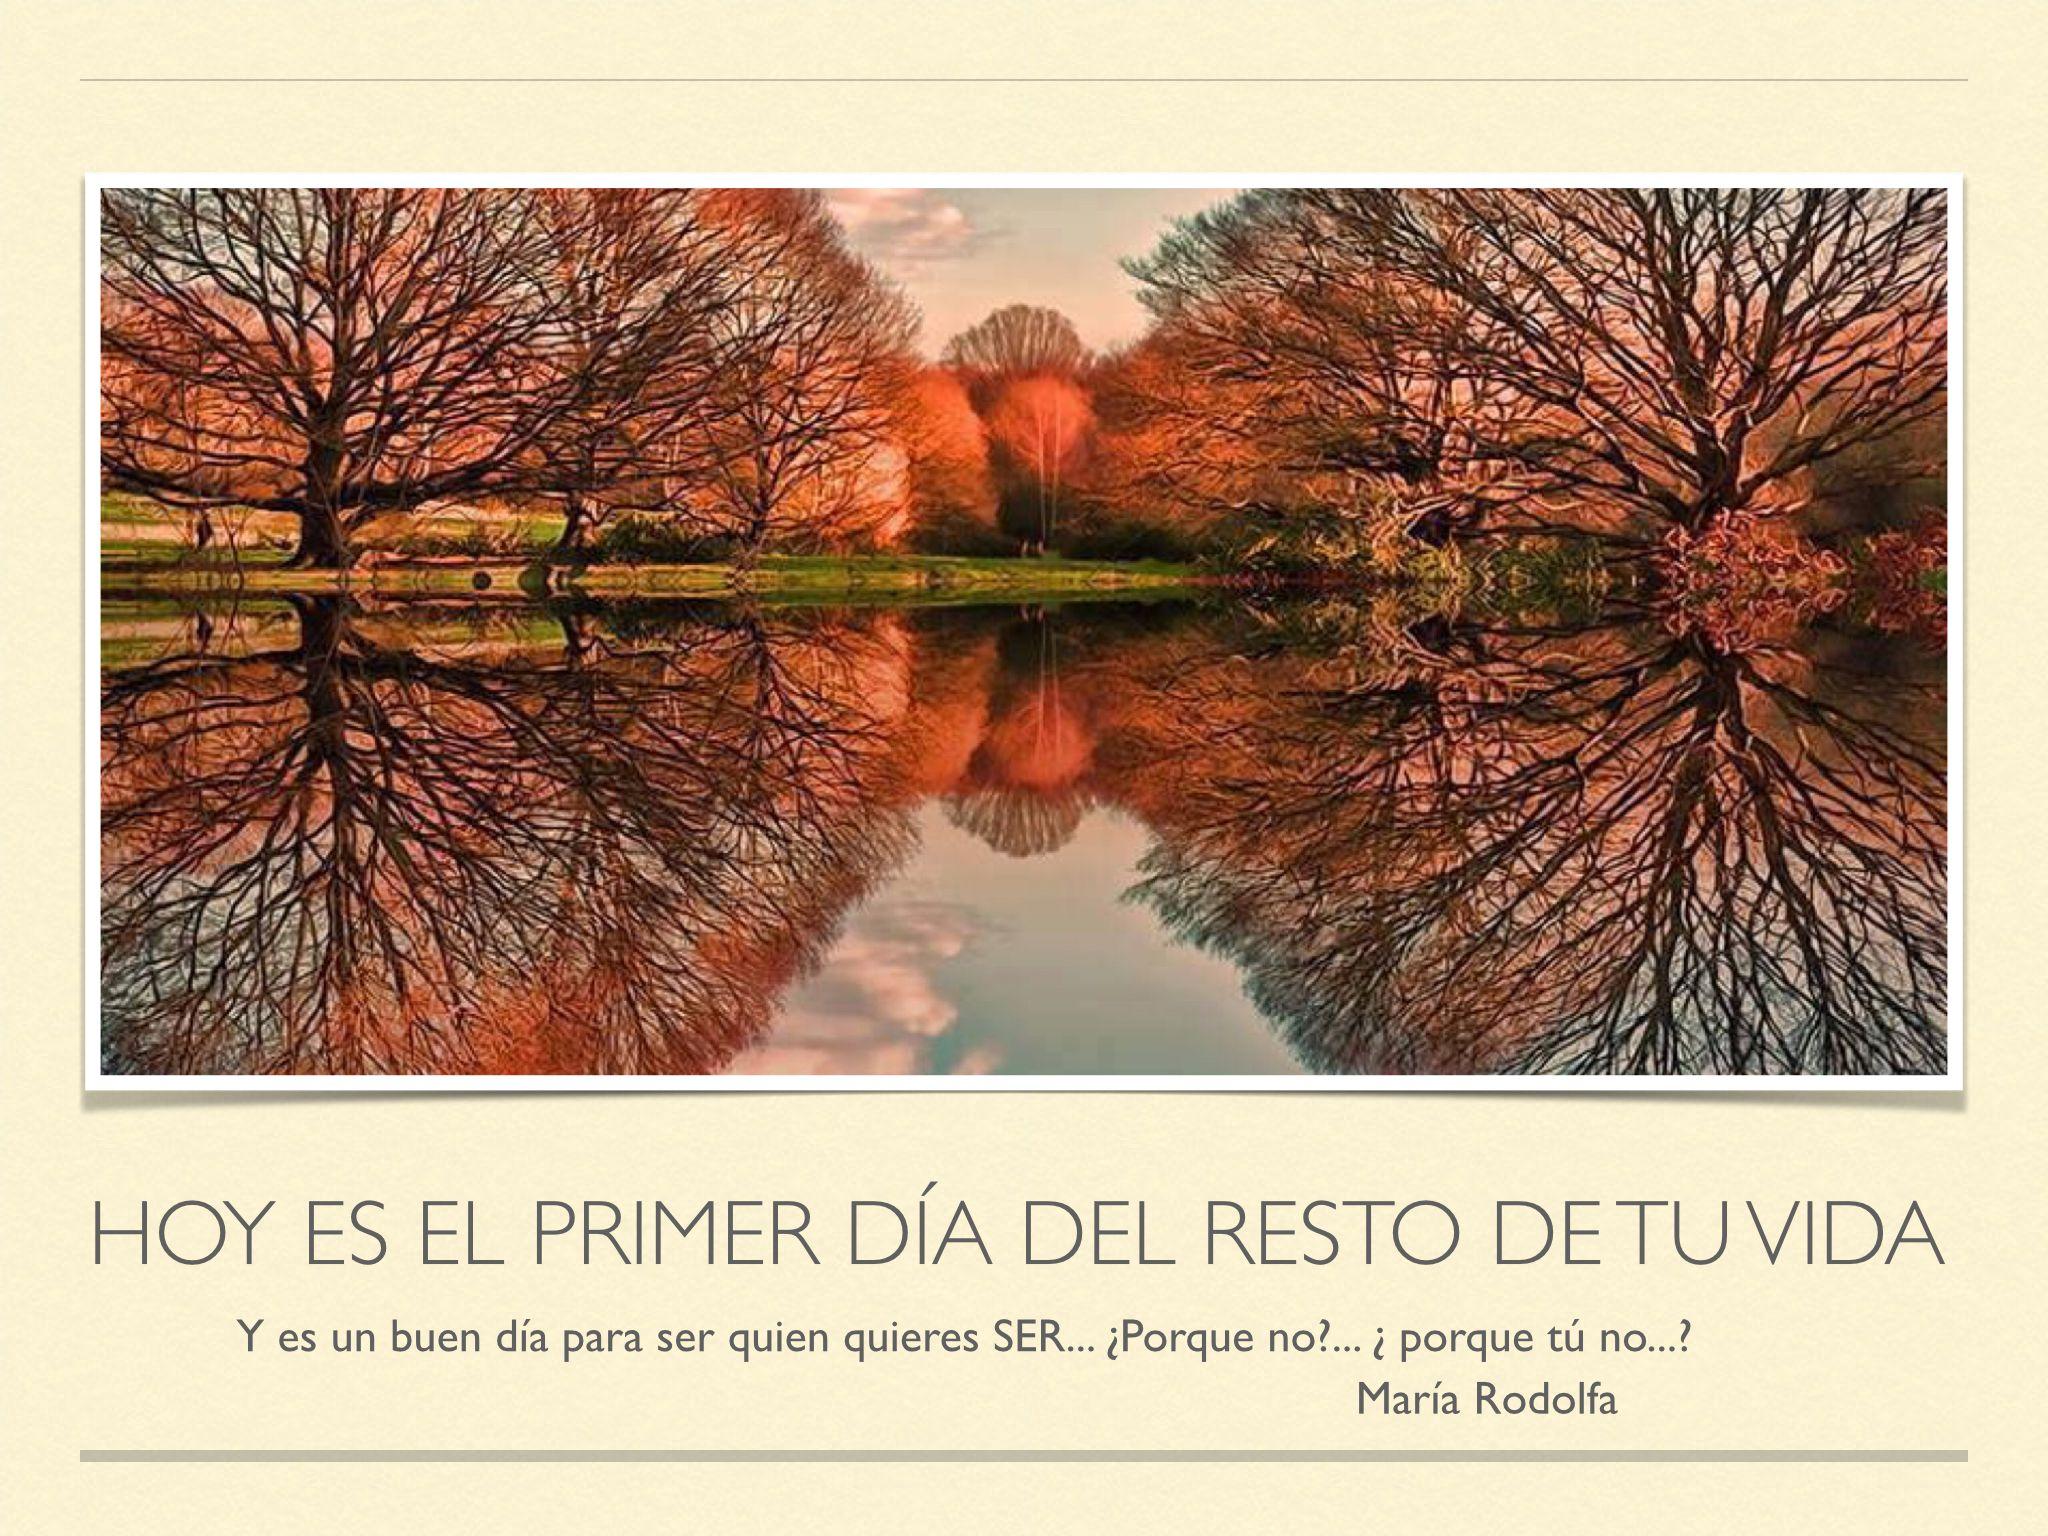 #abundancia, #Ser, #paz